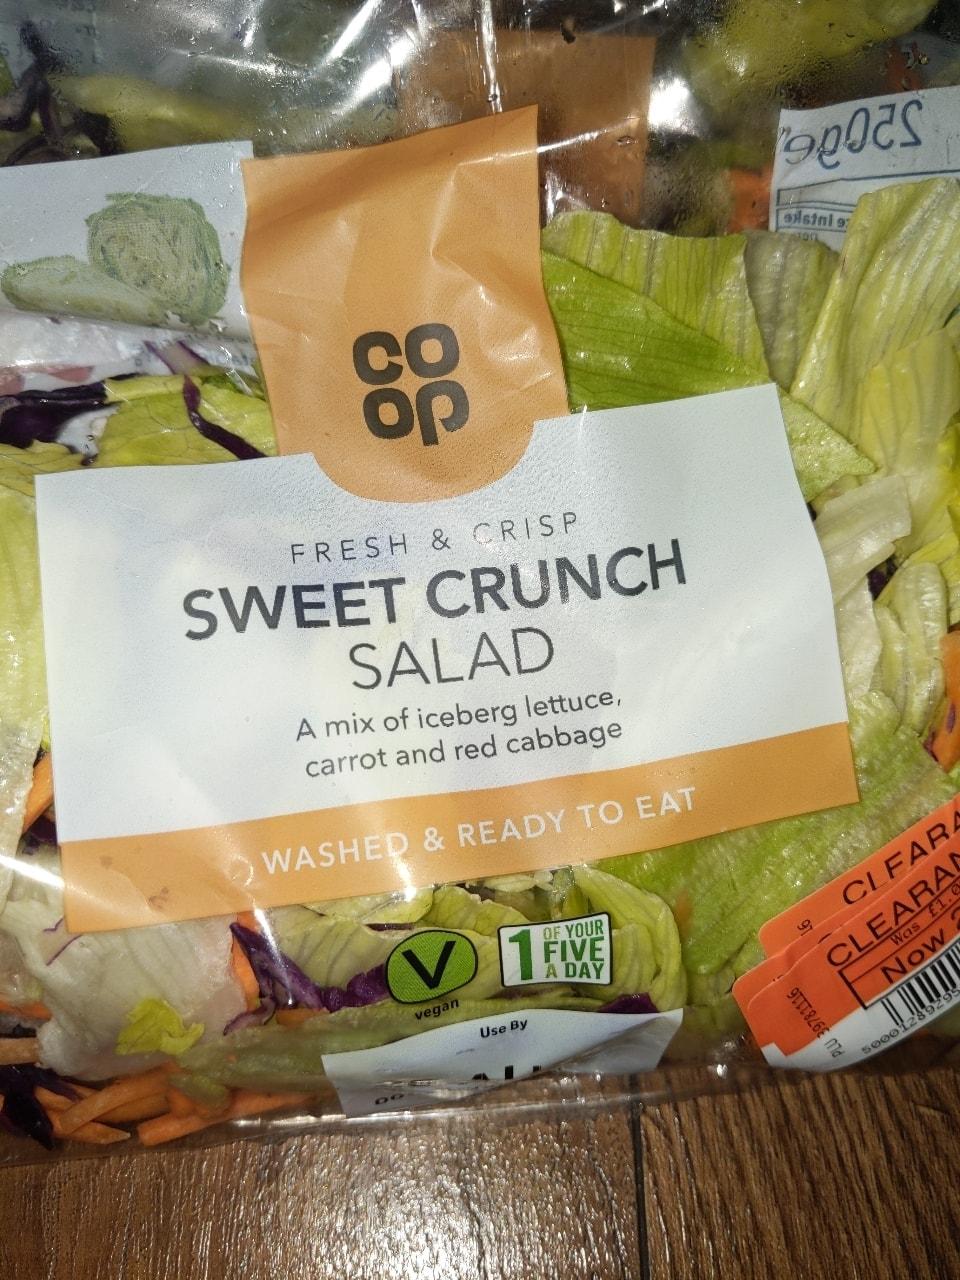 Sweet crunch salad